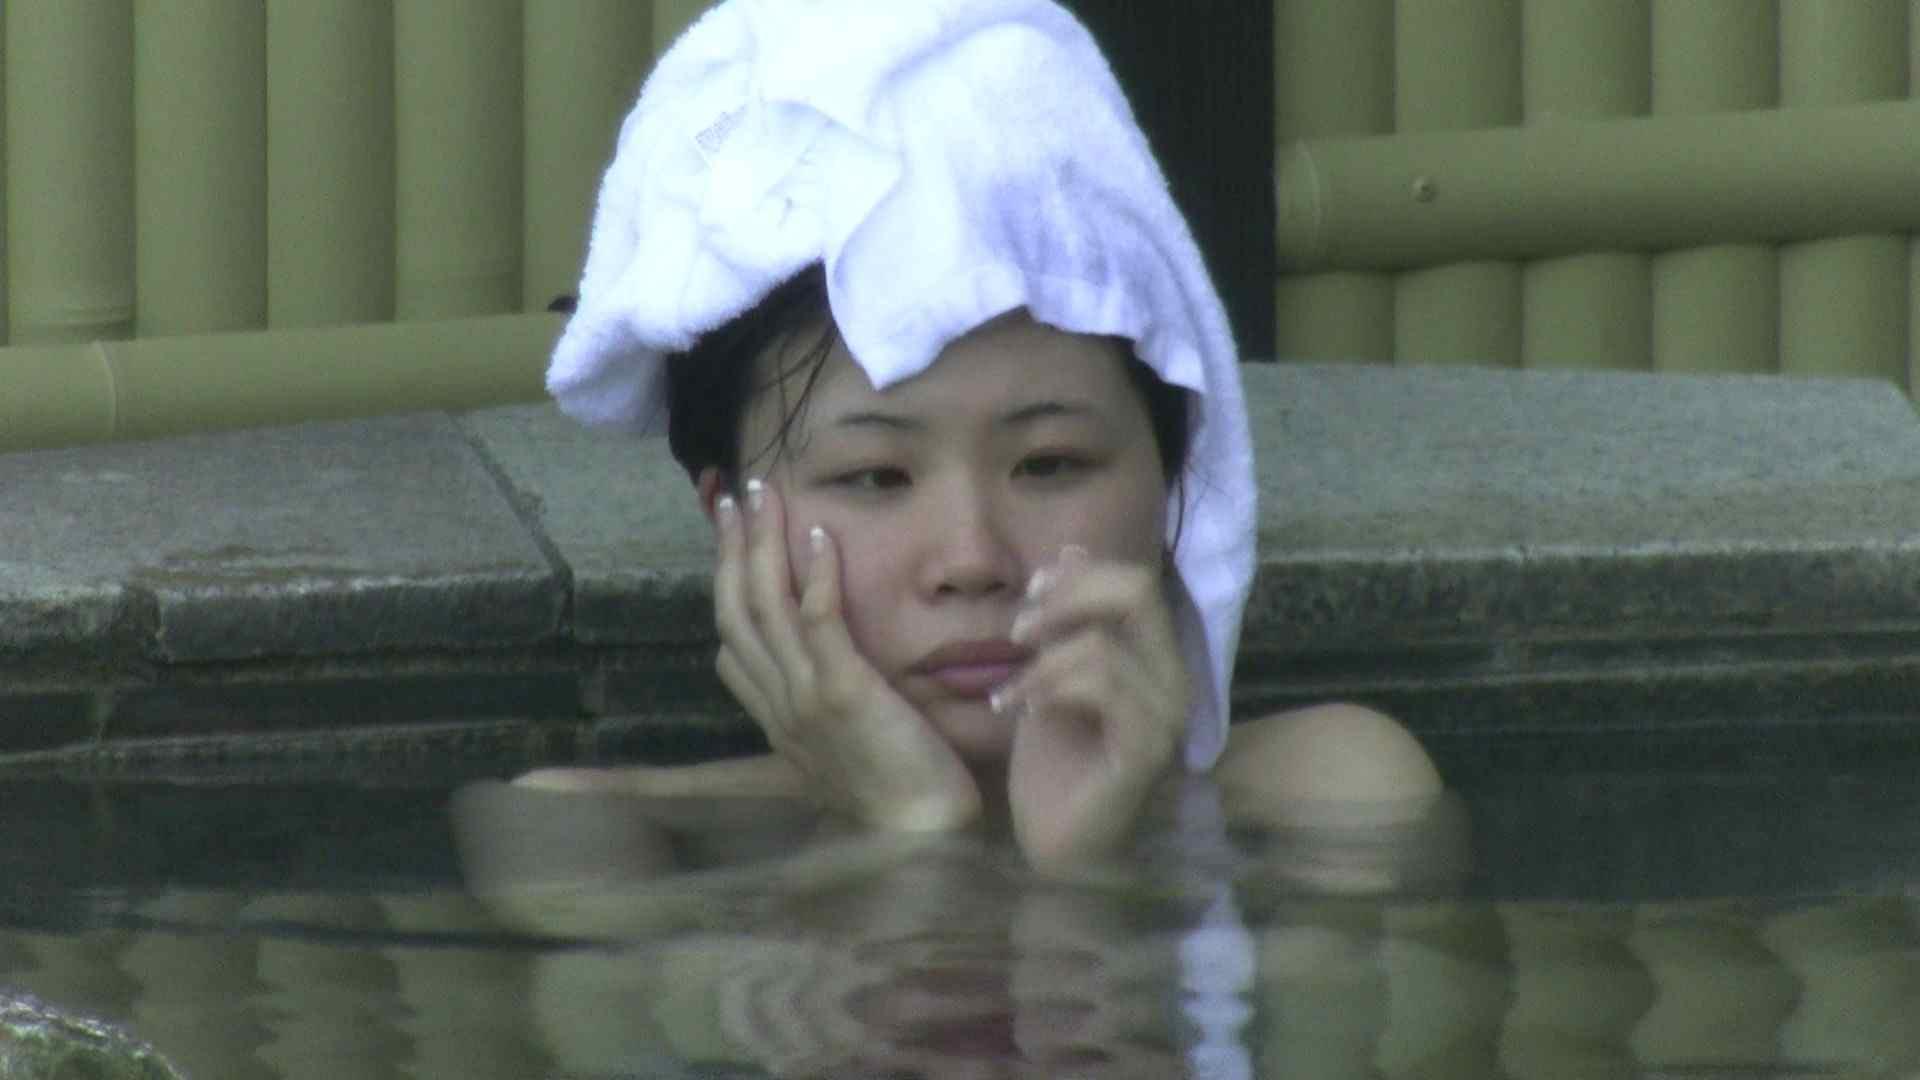 Aquaな露天風呂Vol.183 露天風呂編  104PIX 6